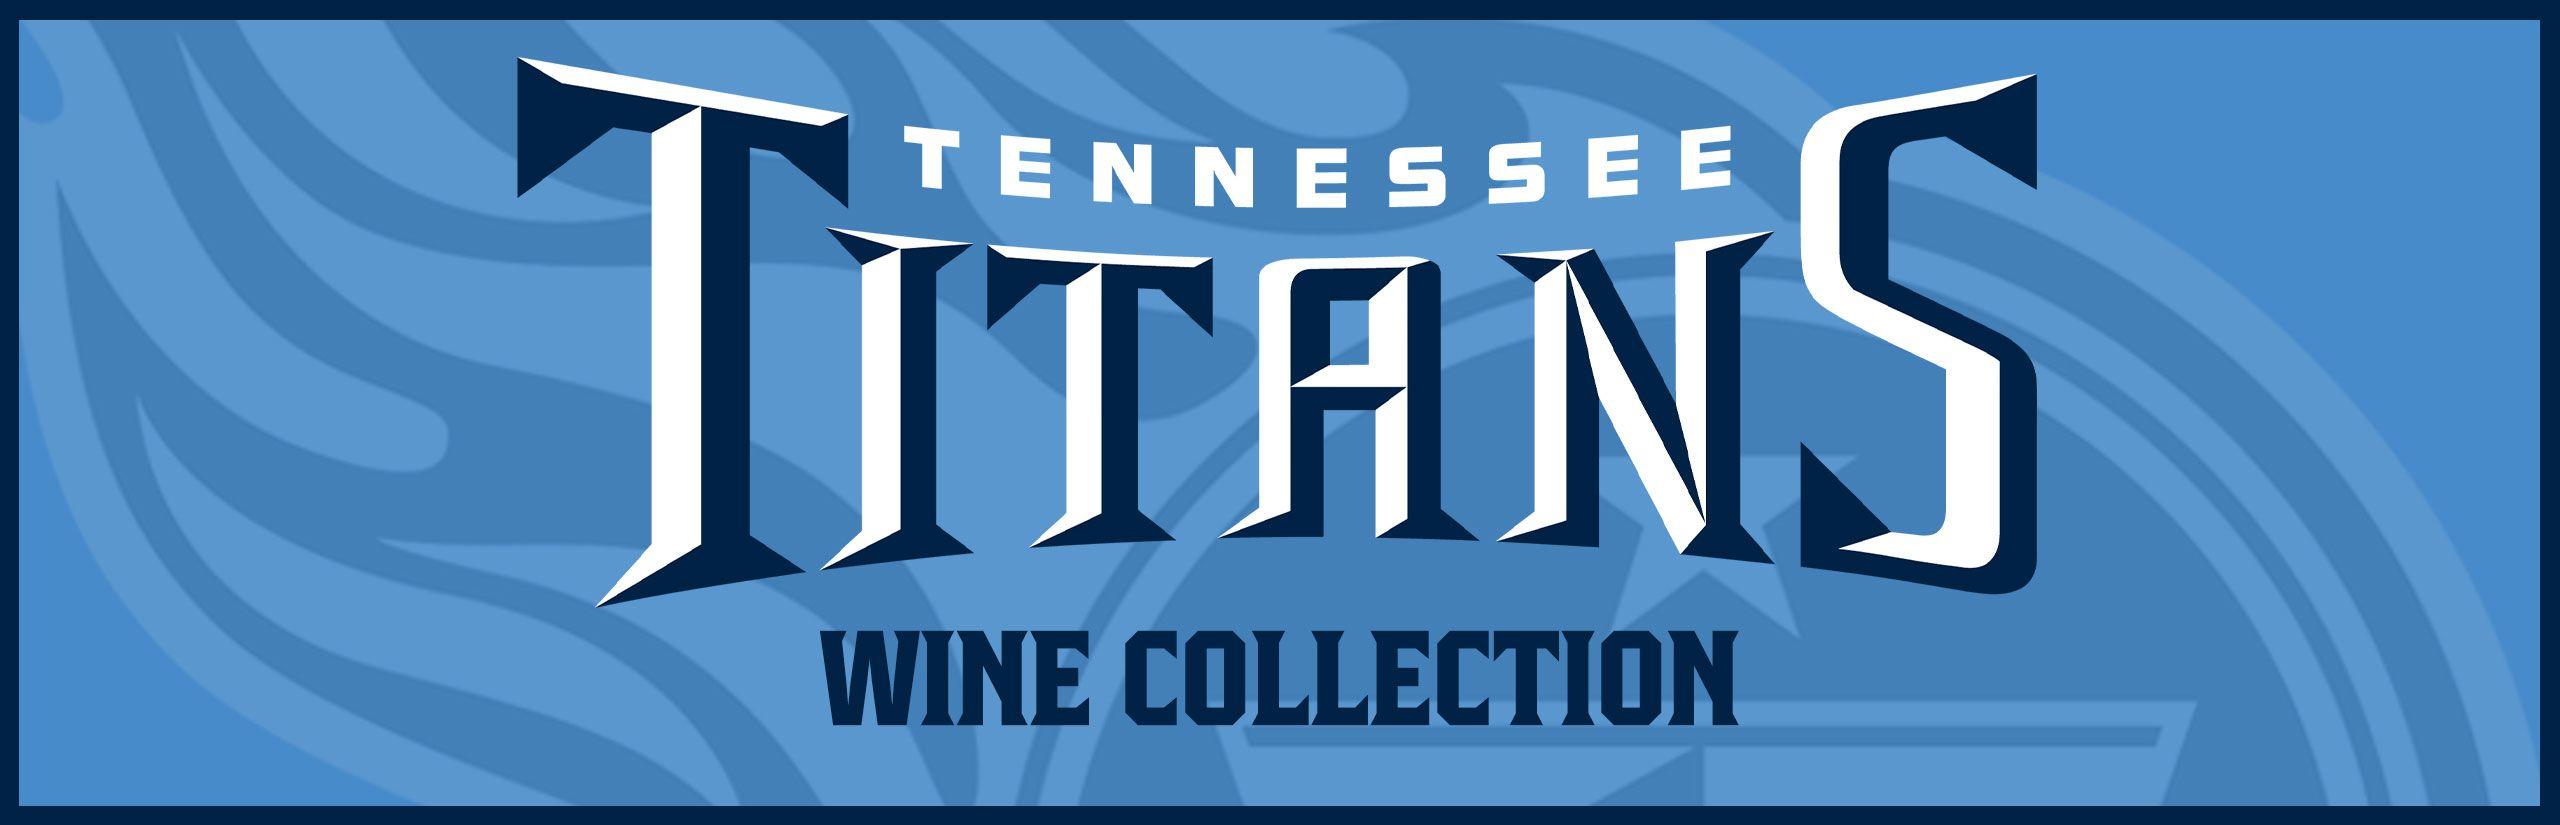 titans-wine-hdr